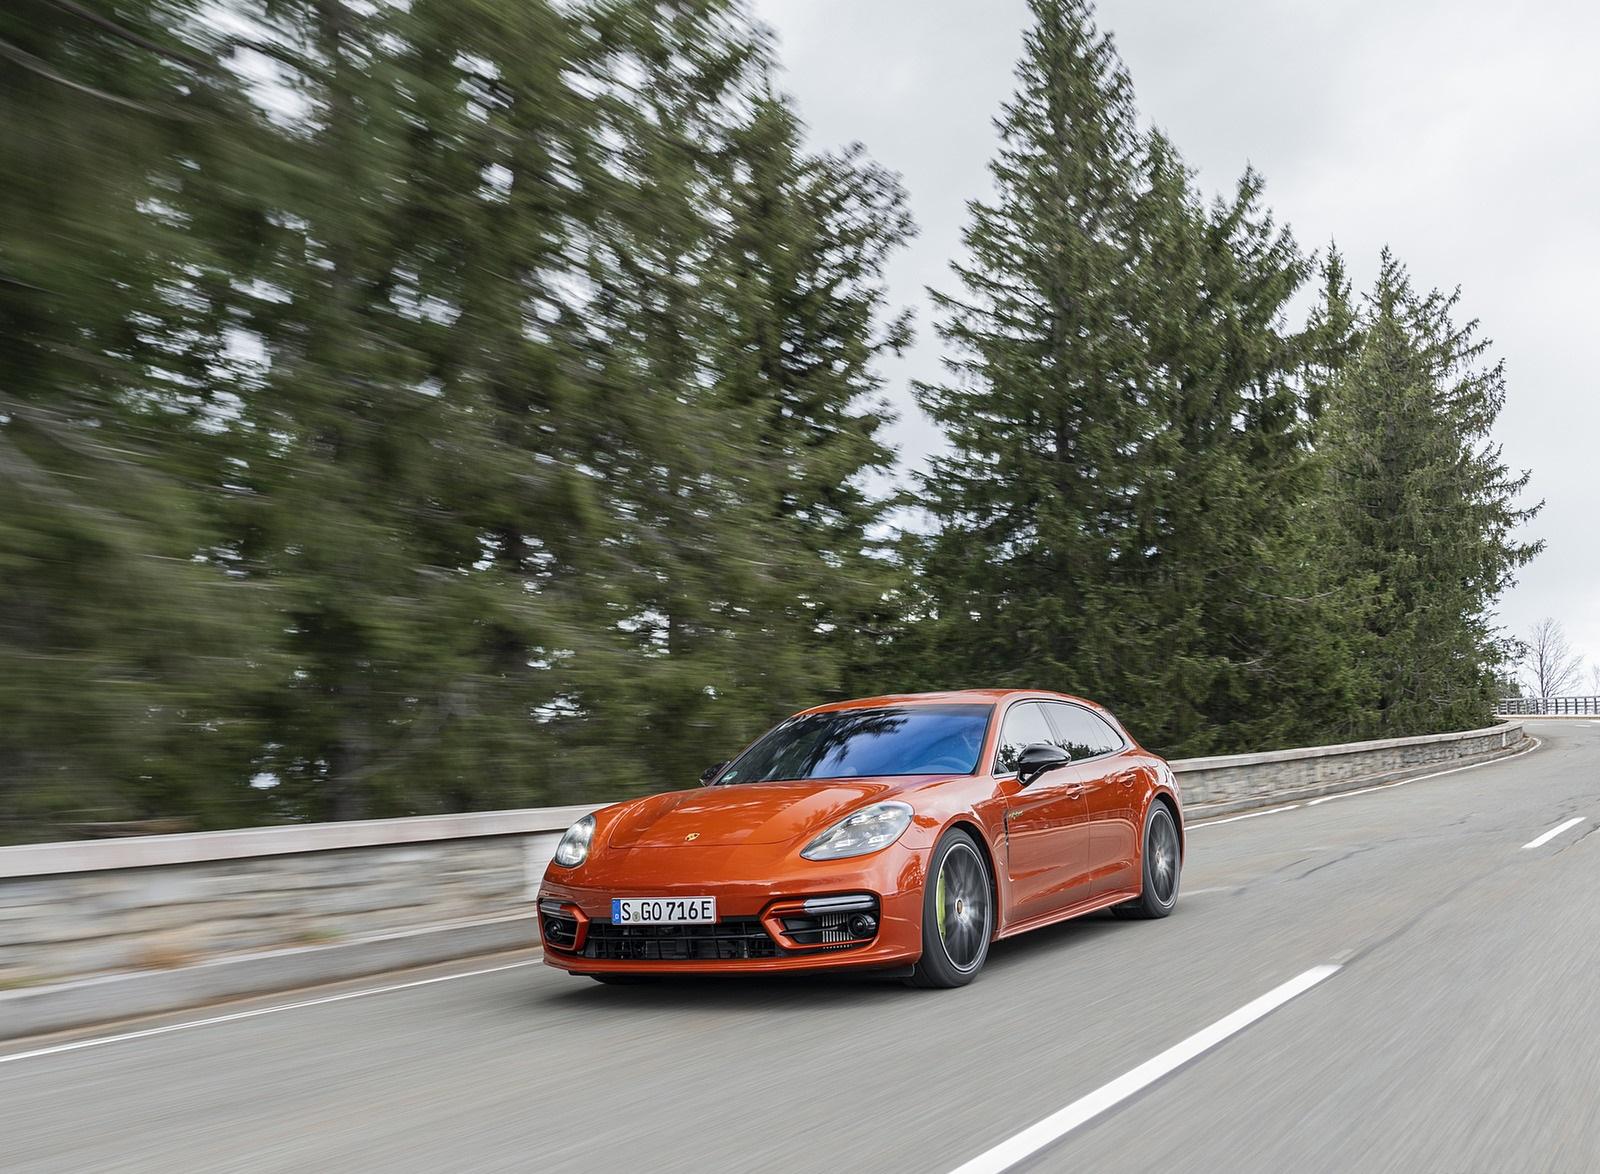 2021 Porsche Panamera 4 E-Hybrid Sport Turismo (Color: Papaya Metallic) Front Three-Quarter Wallpapers (6)